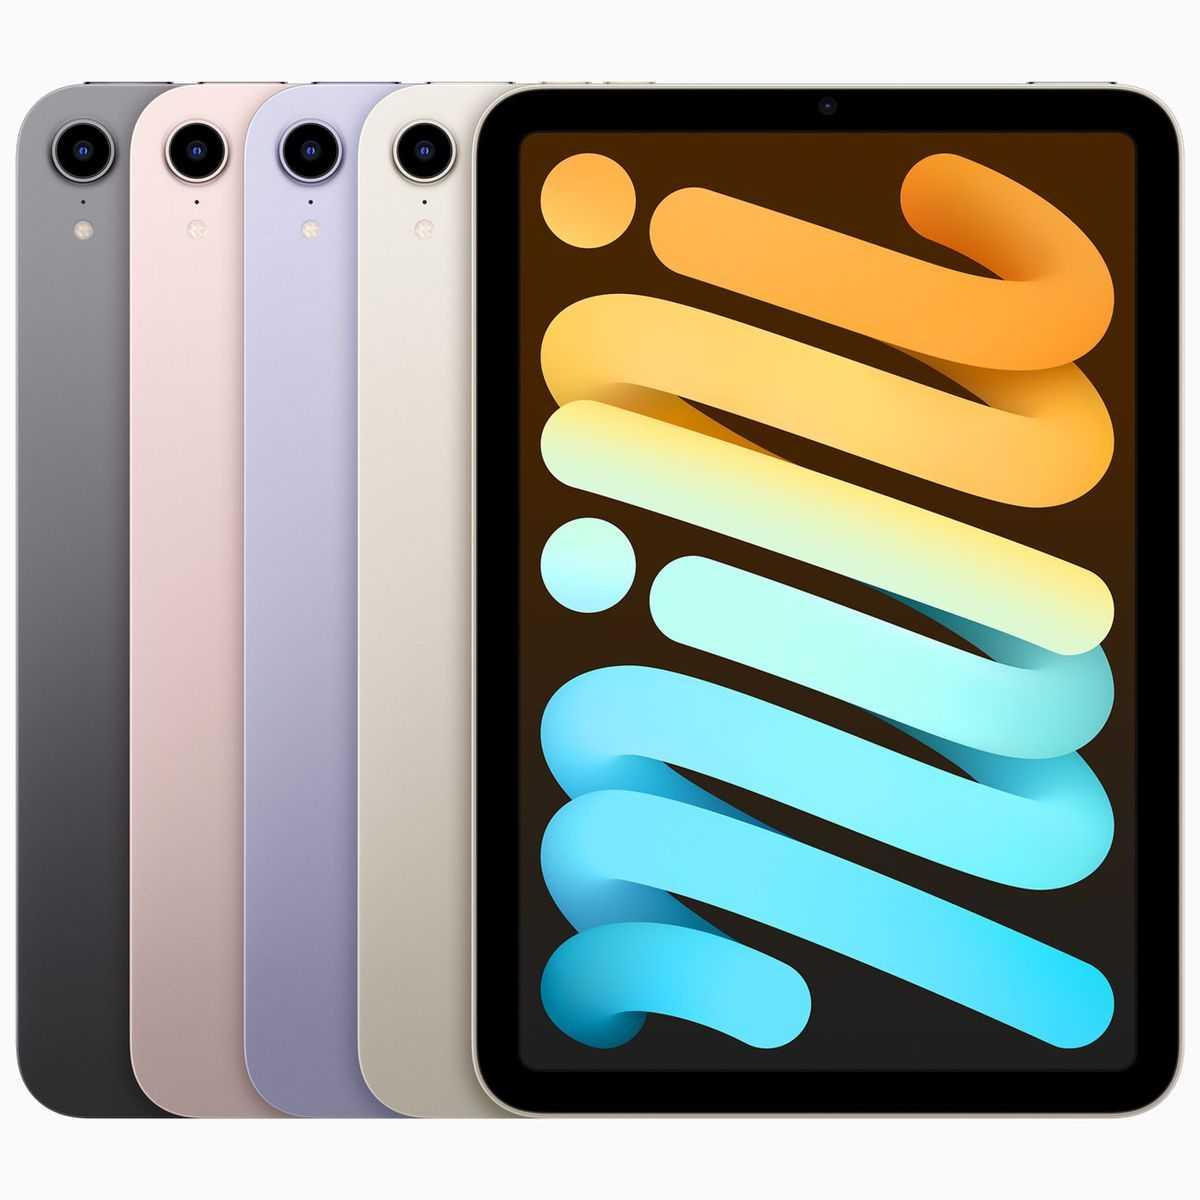 New iPad mini: officially announced